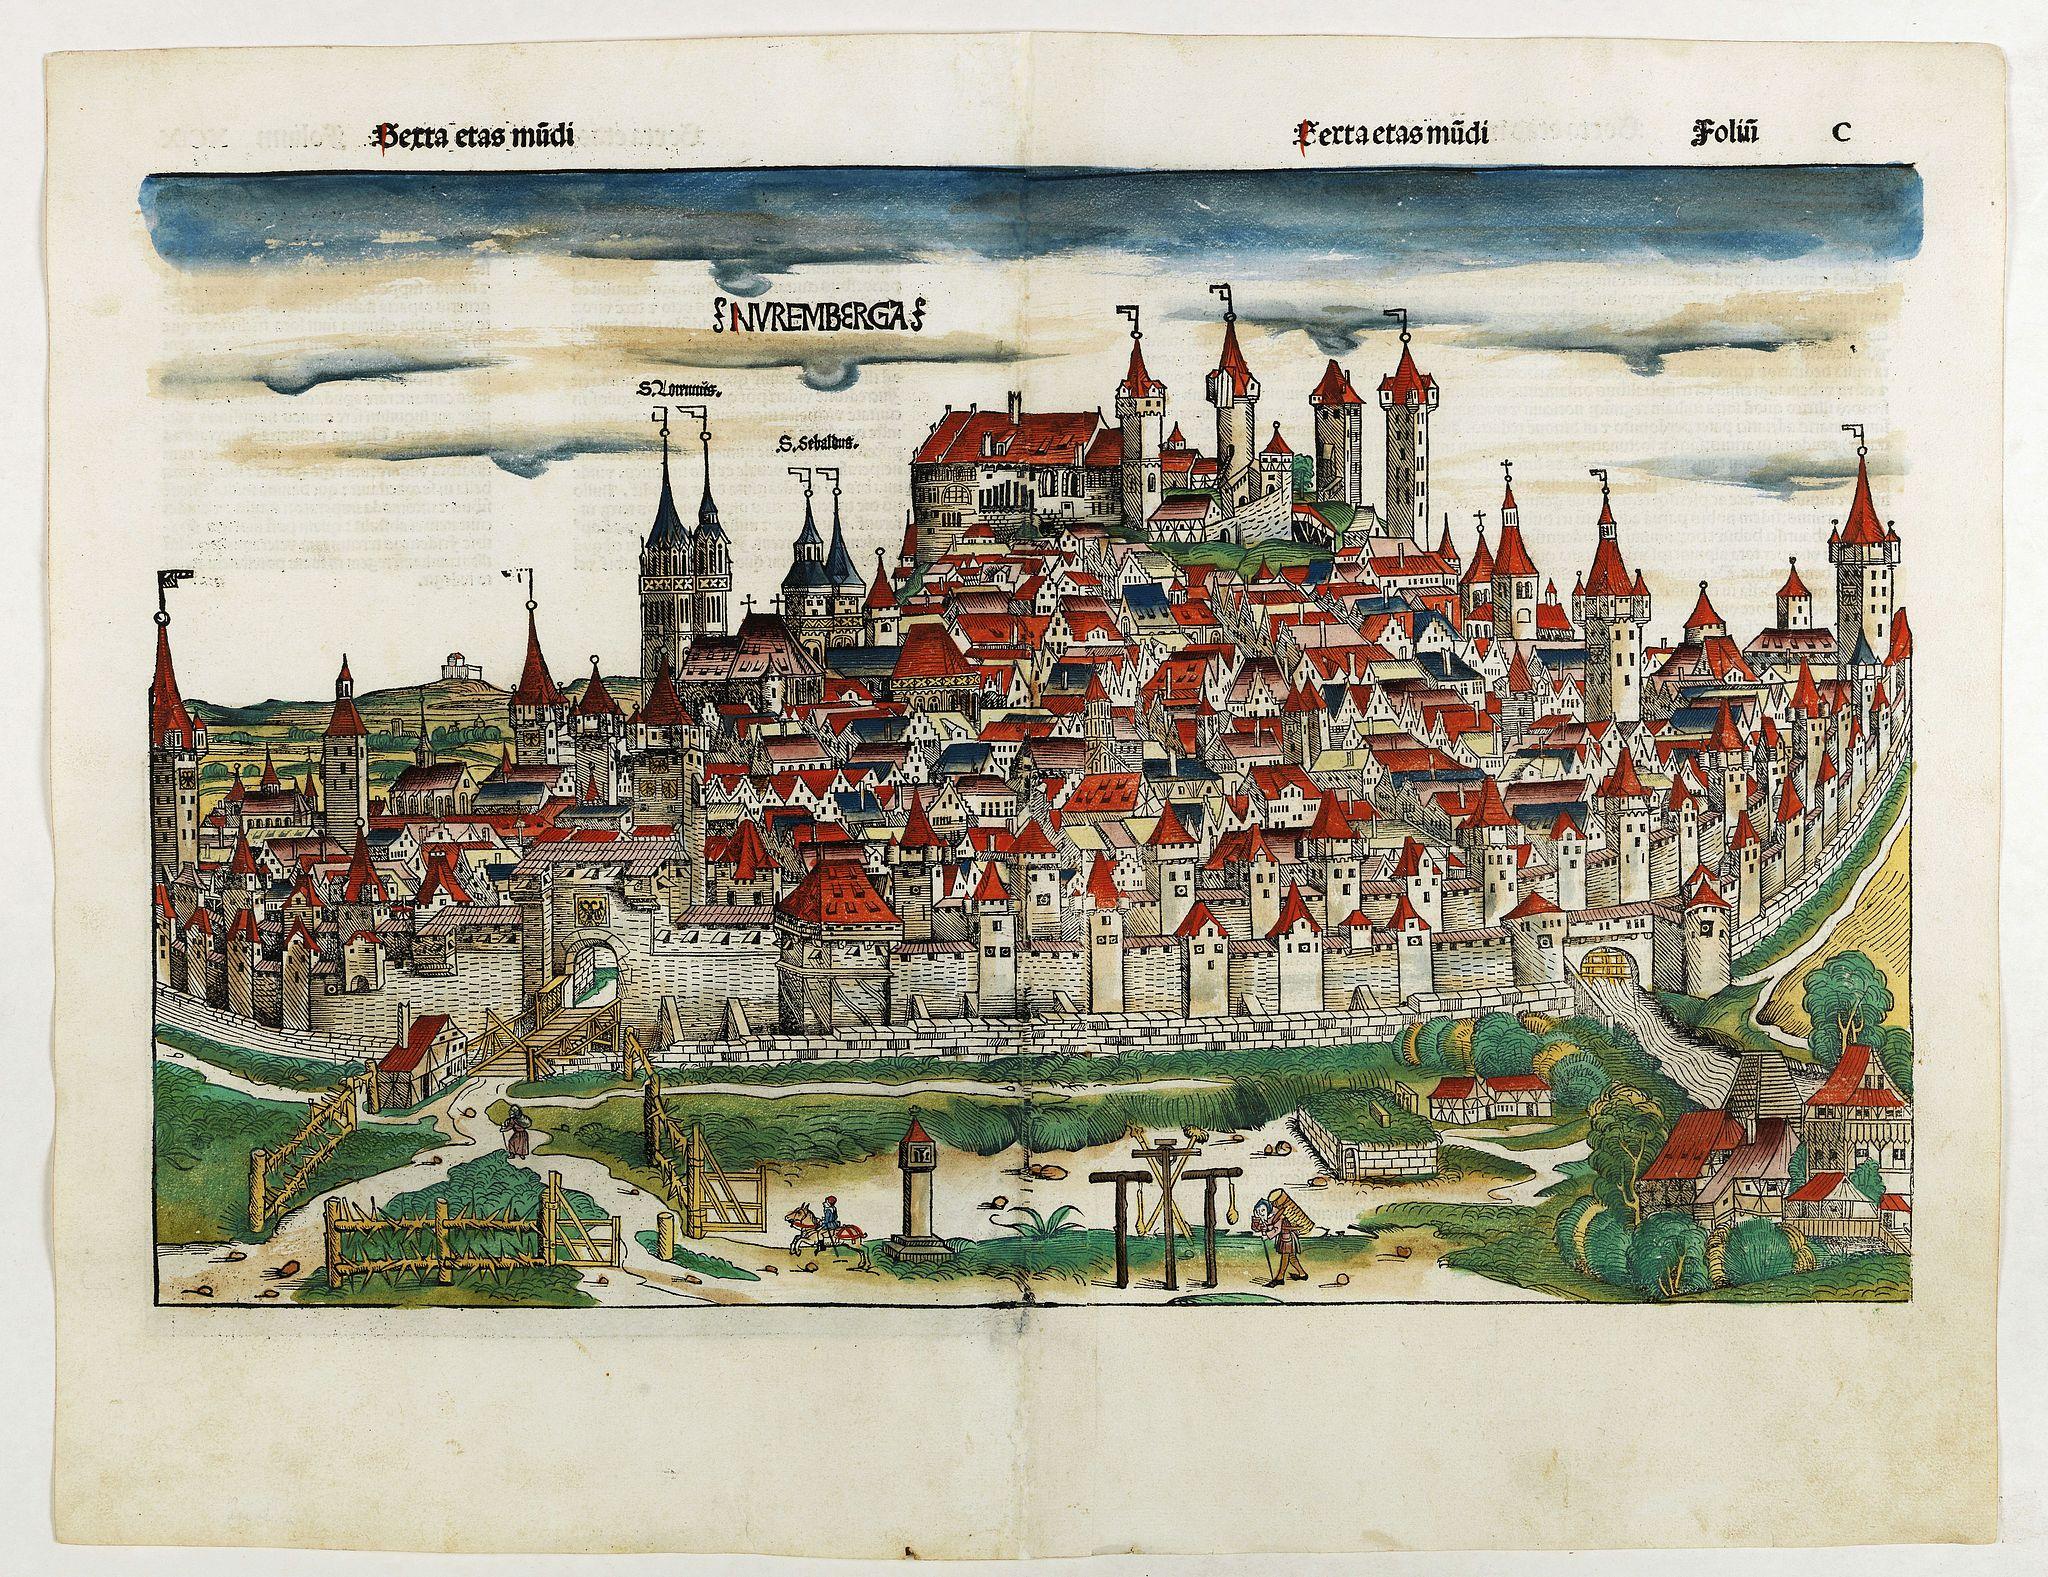 SCHEDEL, H. -  Nuremberga. Folio C.